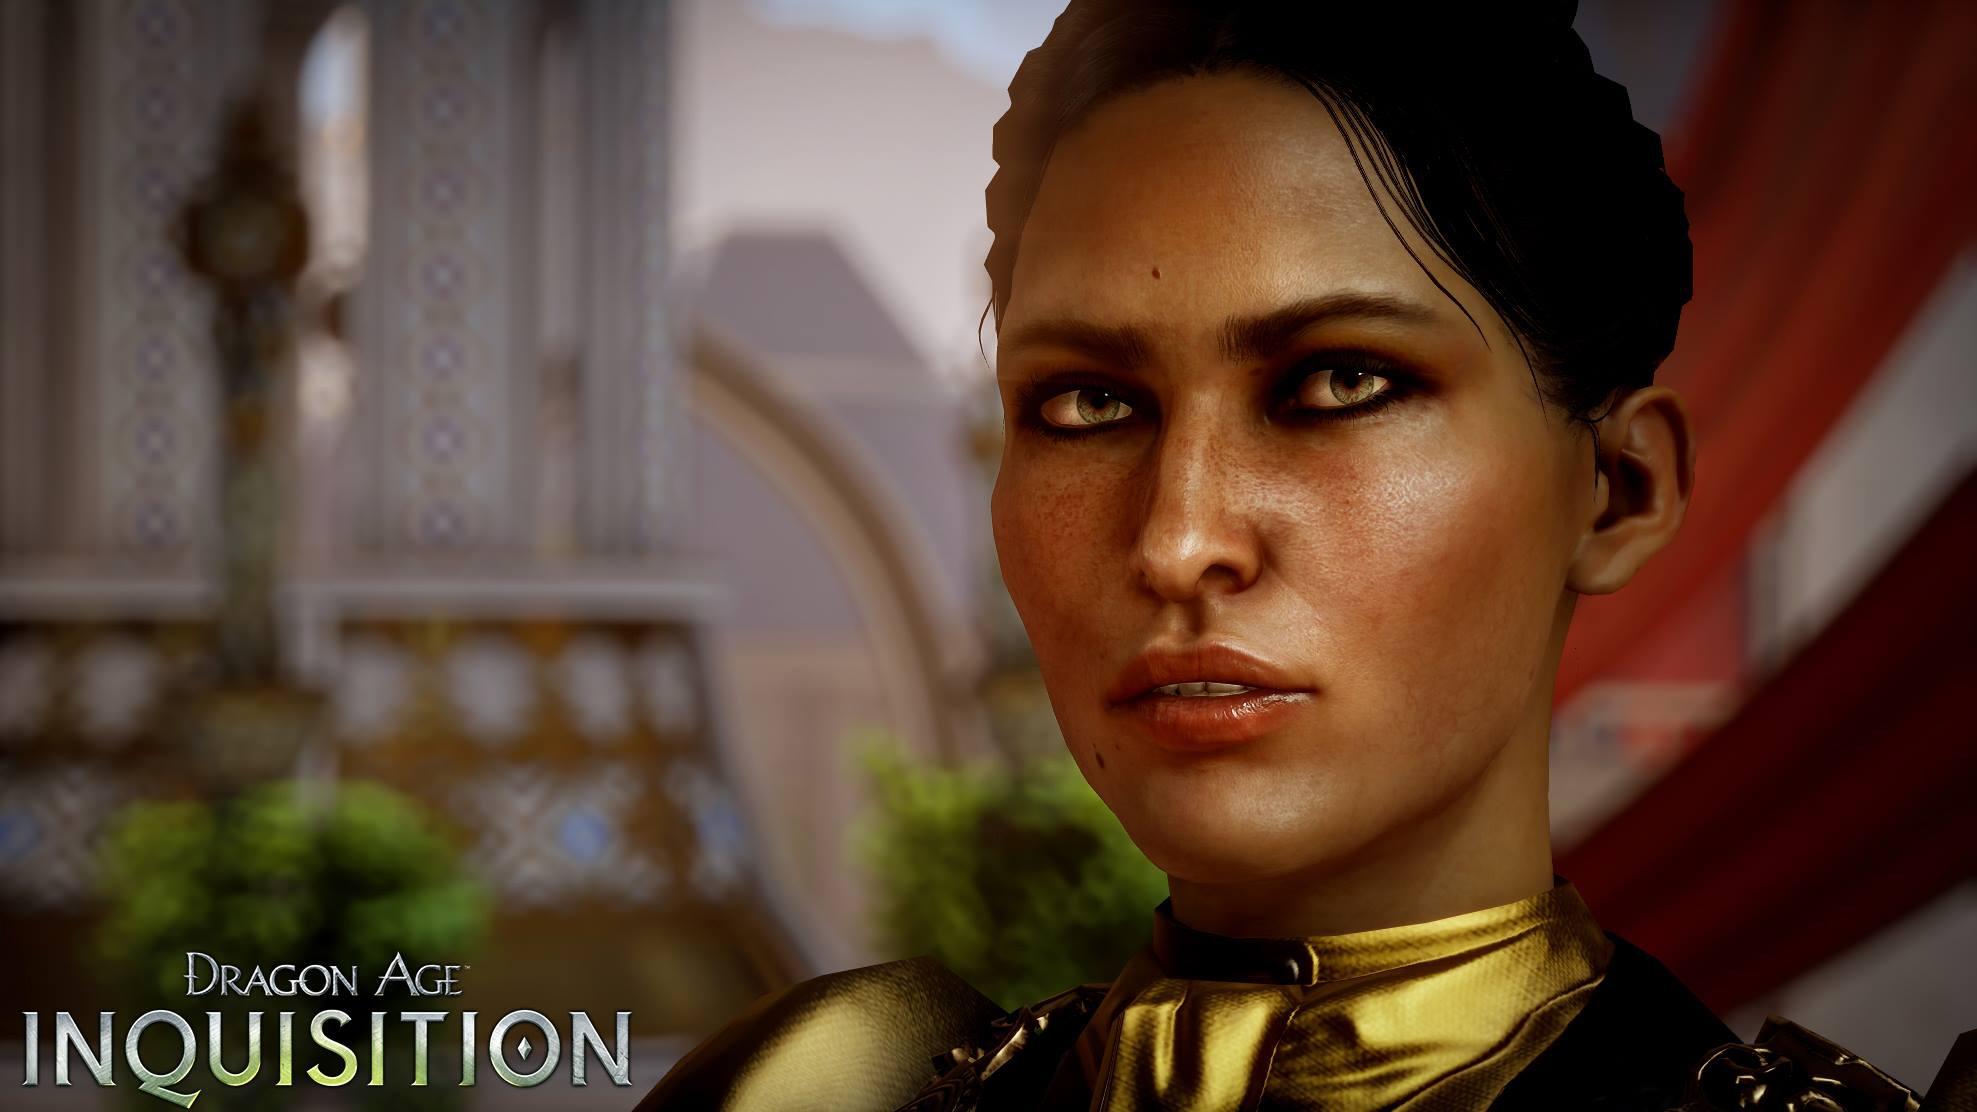 Dragon age inquisition dating josephine